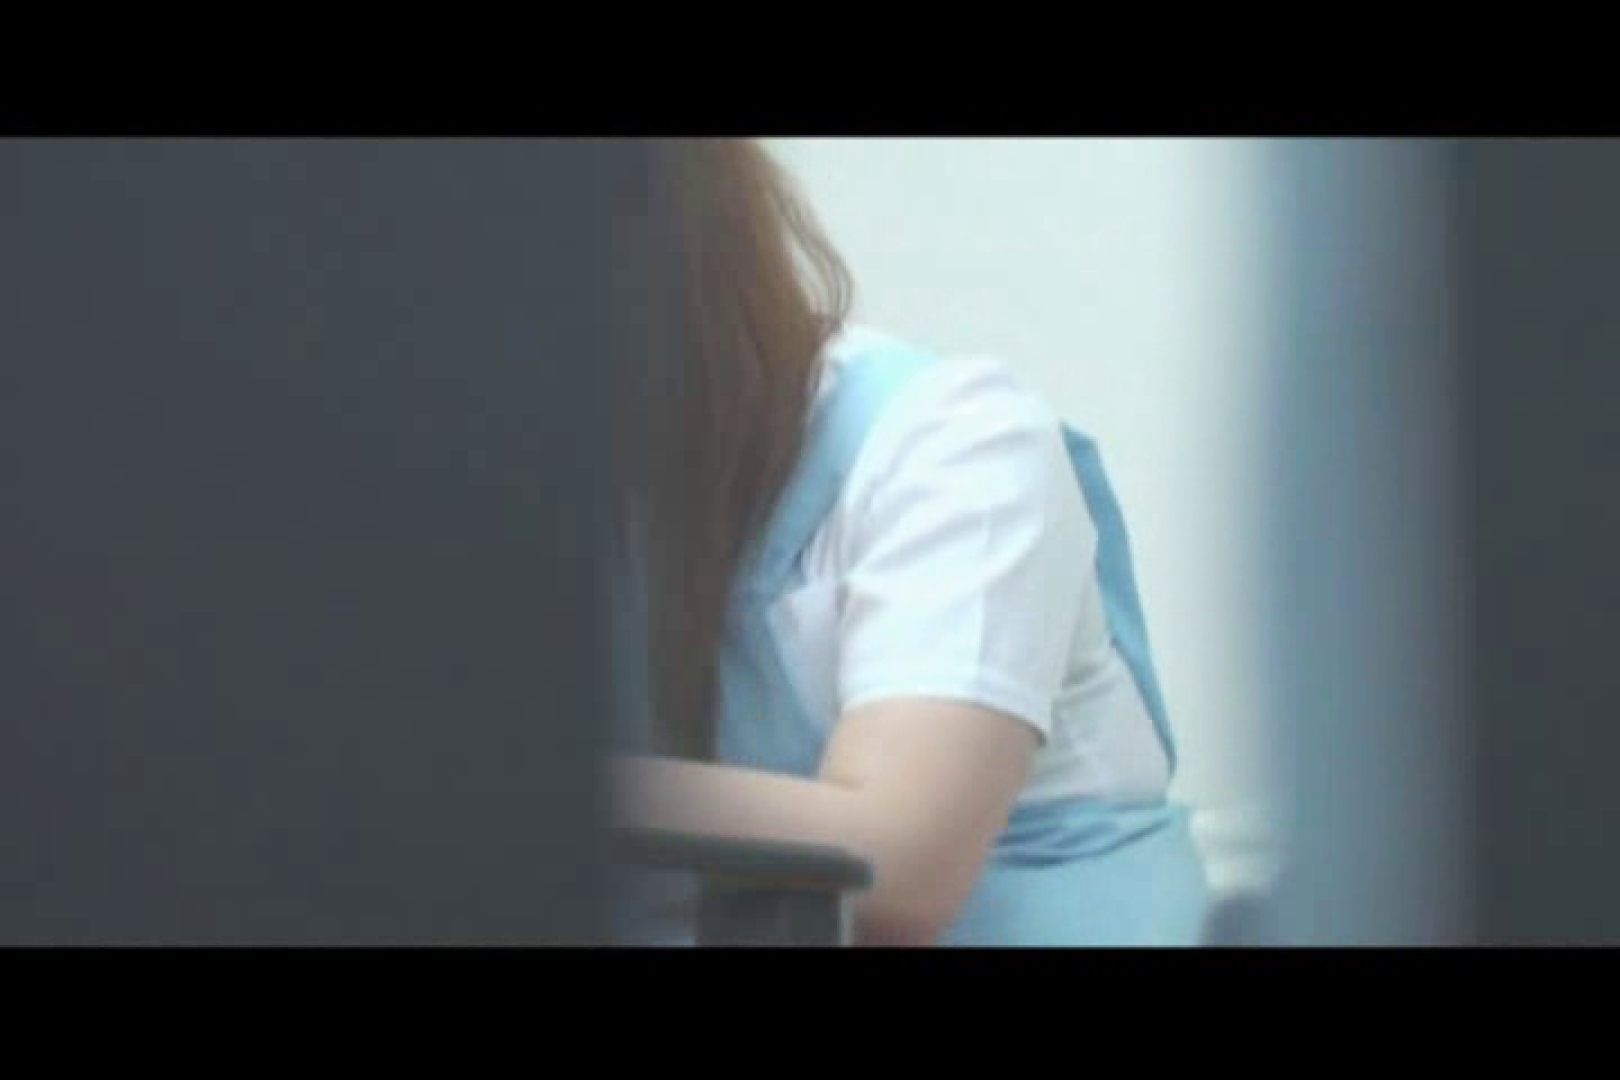 独占配信!無修正! 看護女子寮 vol.12 ナースのエロ動画 SEX無修正画像 78PIX 50